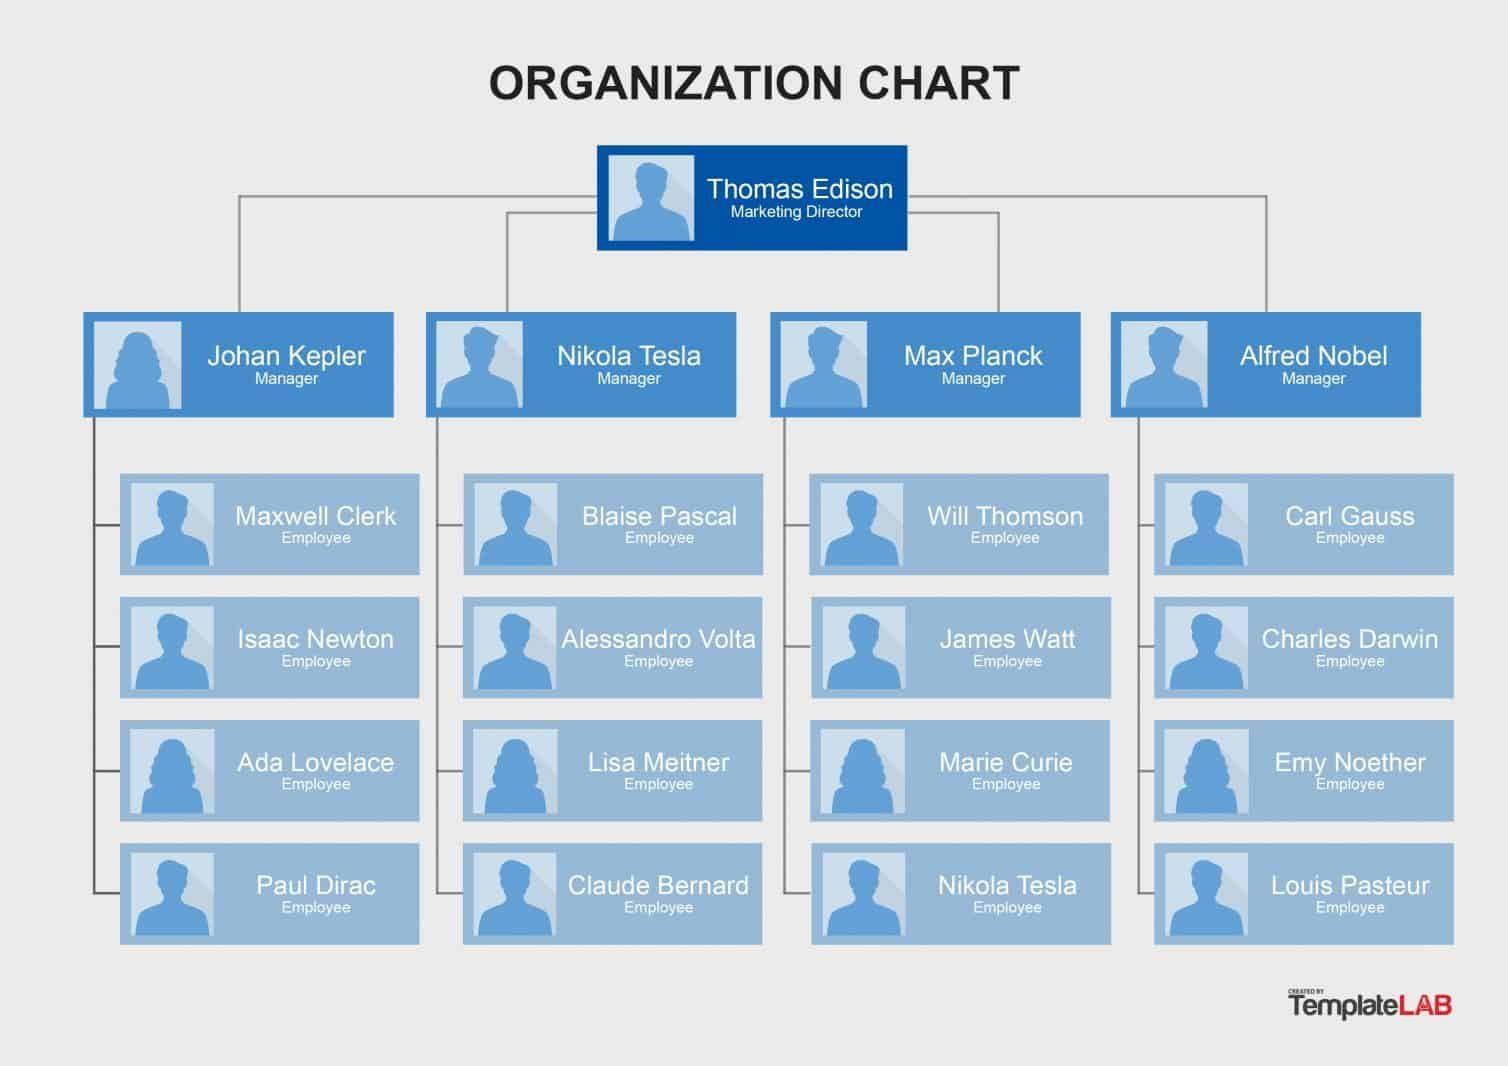 008 Unforgettable Microsoft Organizational Chart Template High Definition  Templates Visio Org M Office Organization PowerpointFull